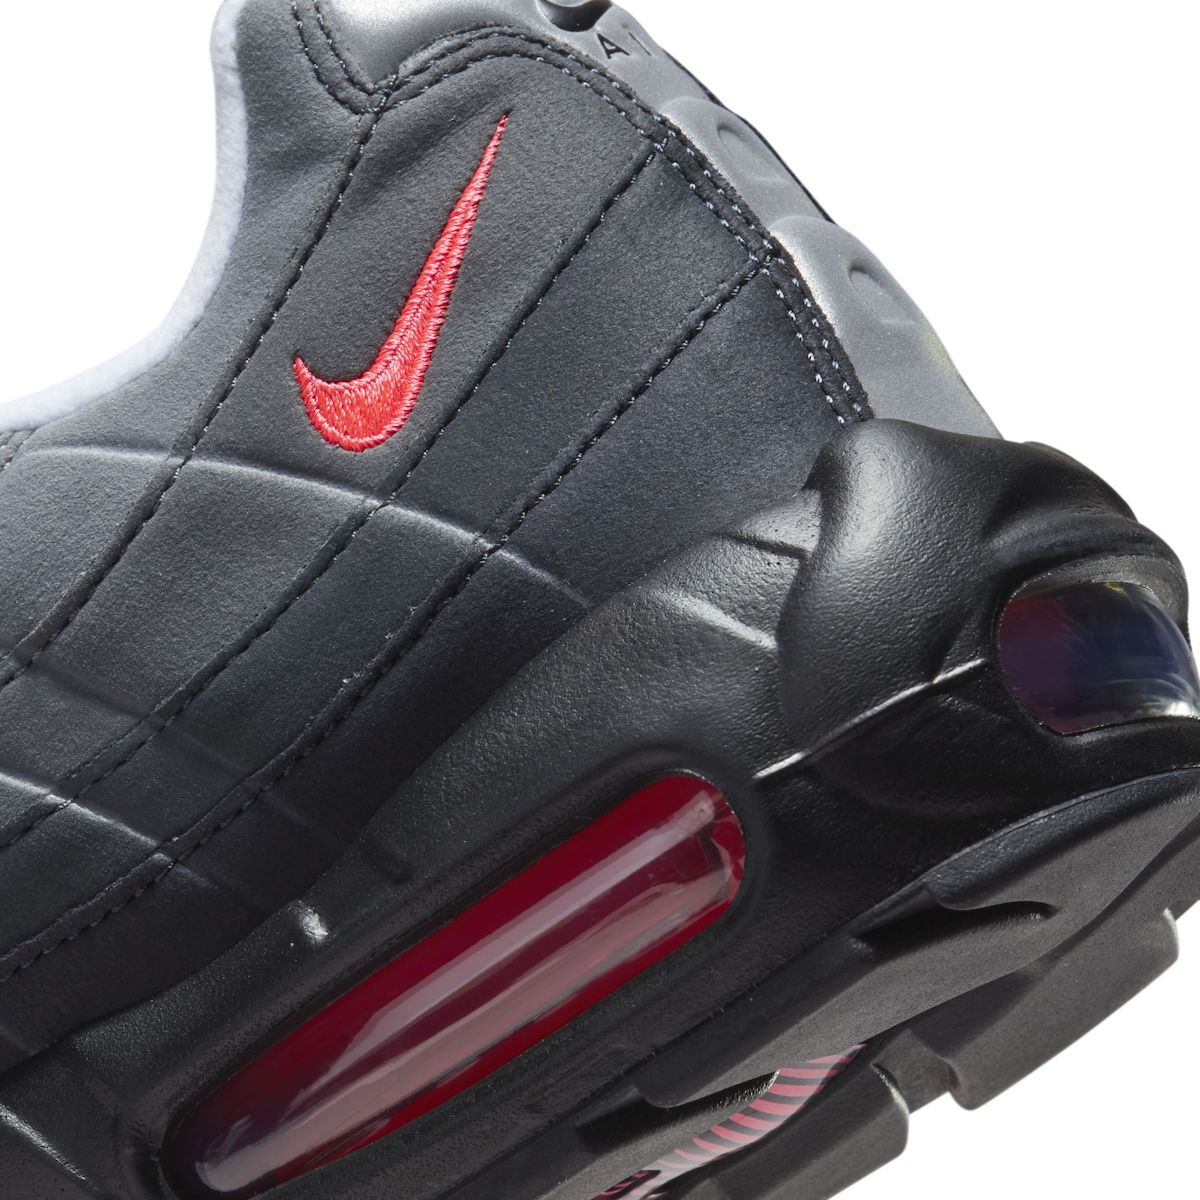 Nike Air Max 95 Greedy 3.0 Release Date Info